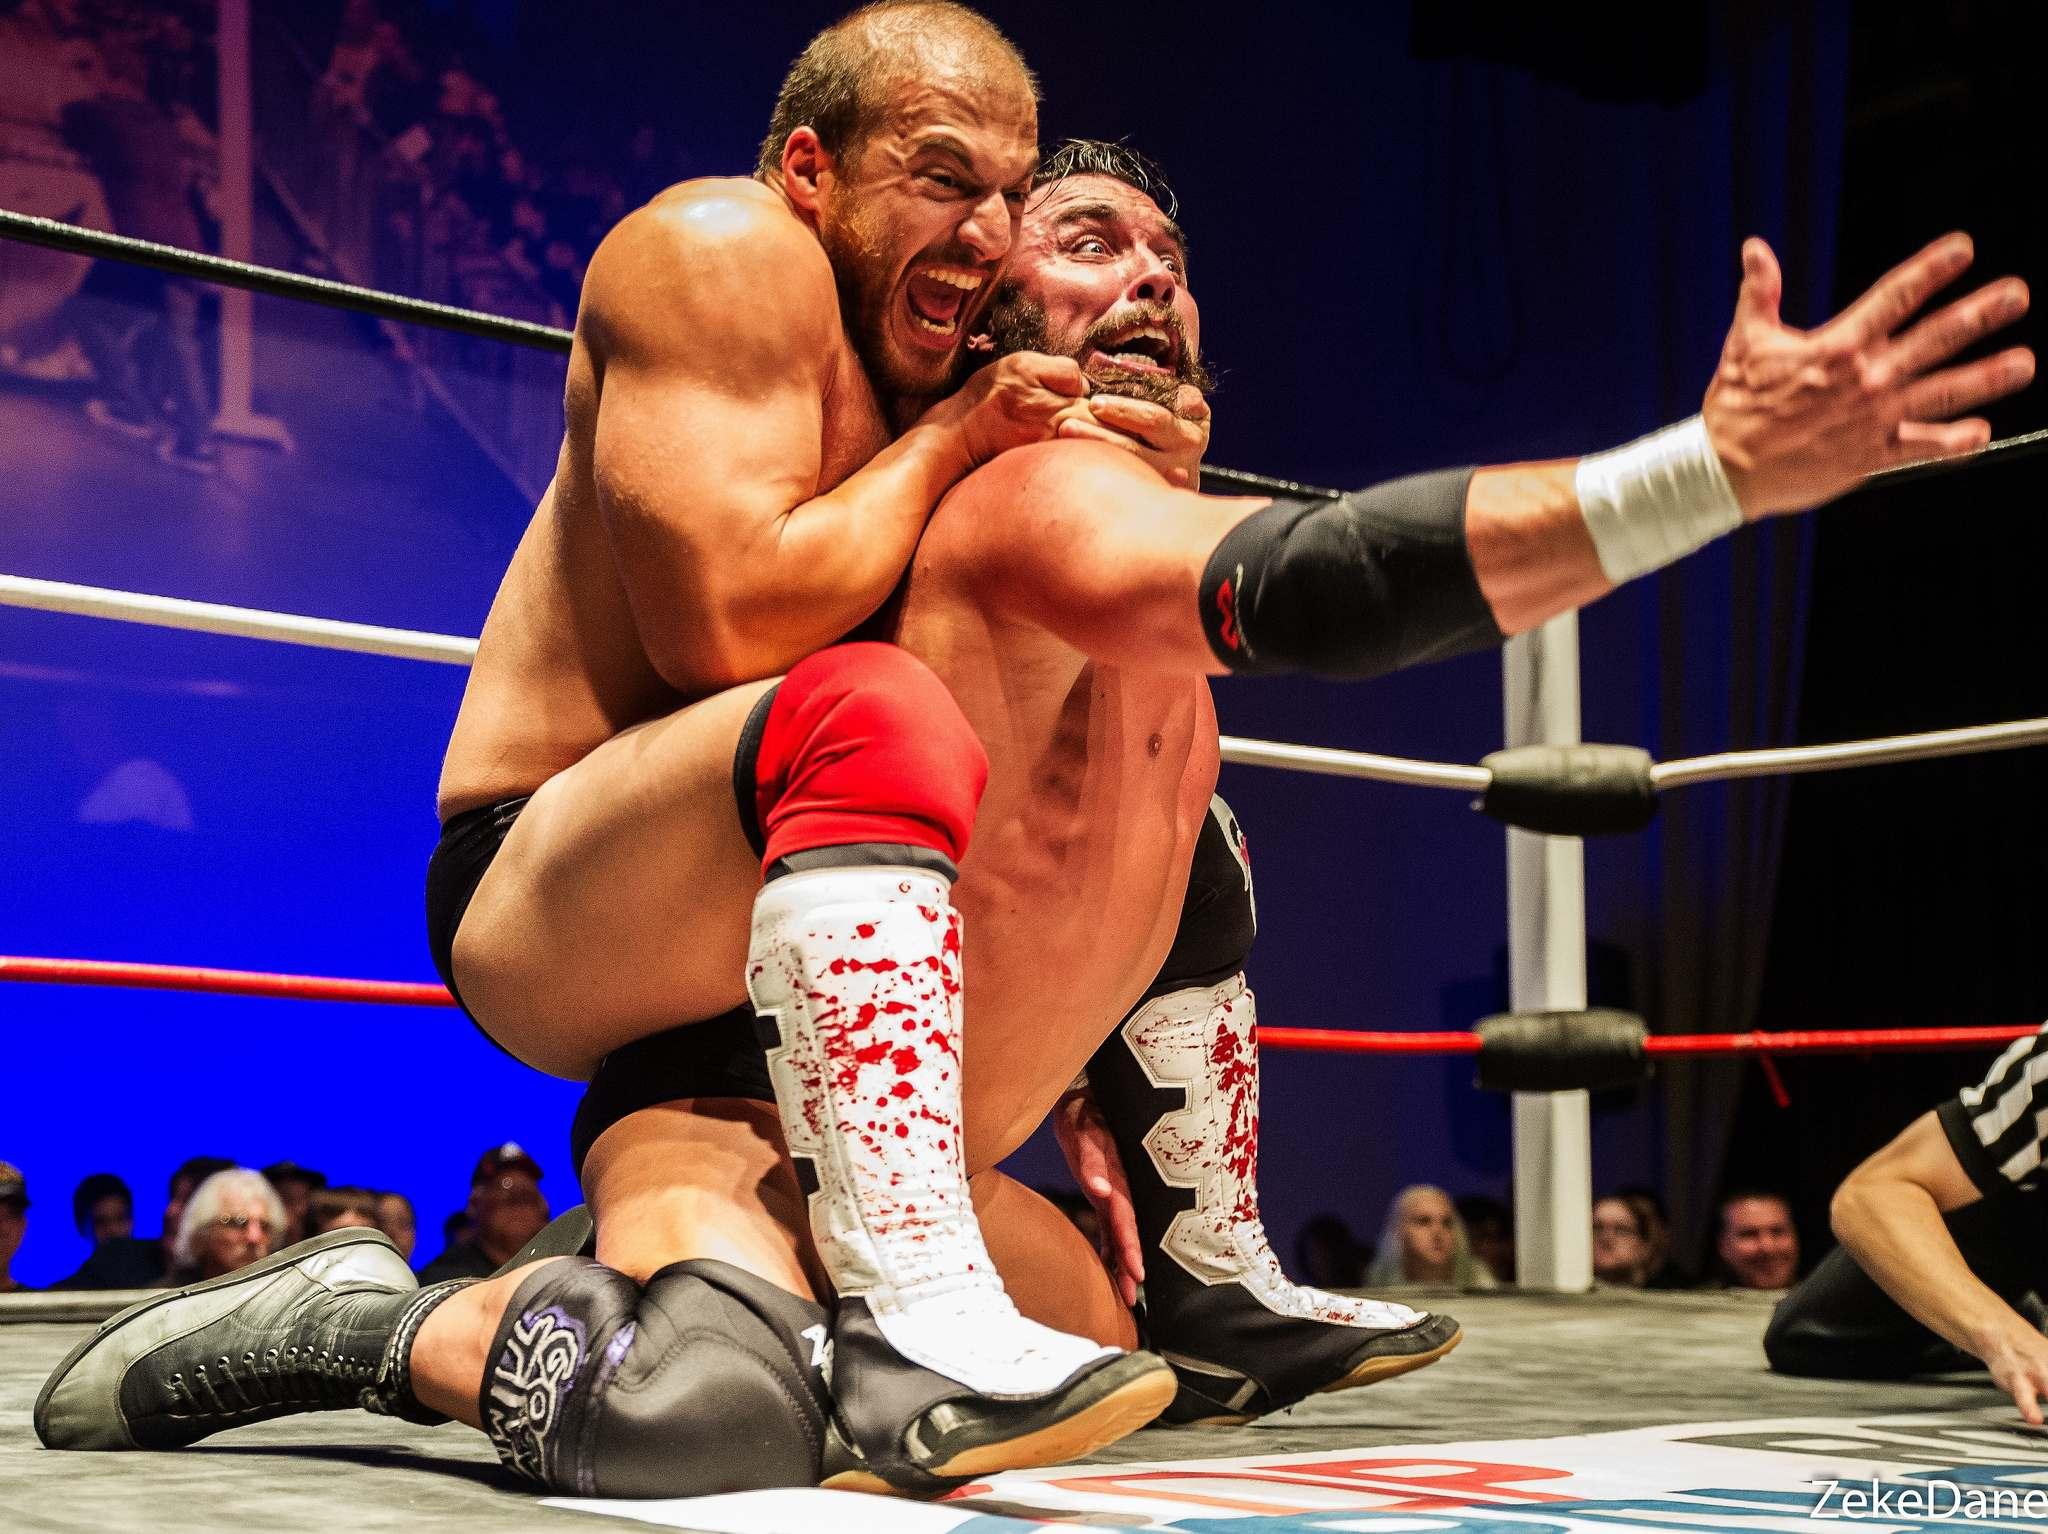 pro wrestling Pro Wrestling in New England 2016